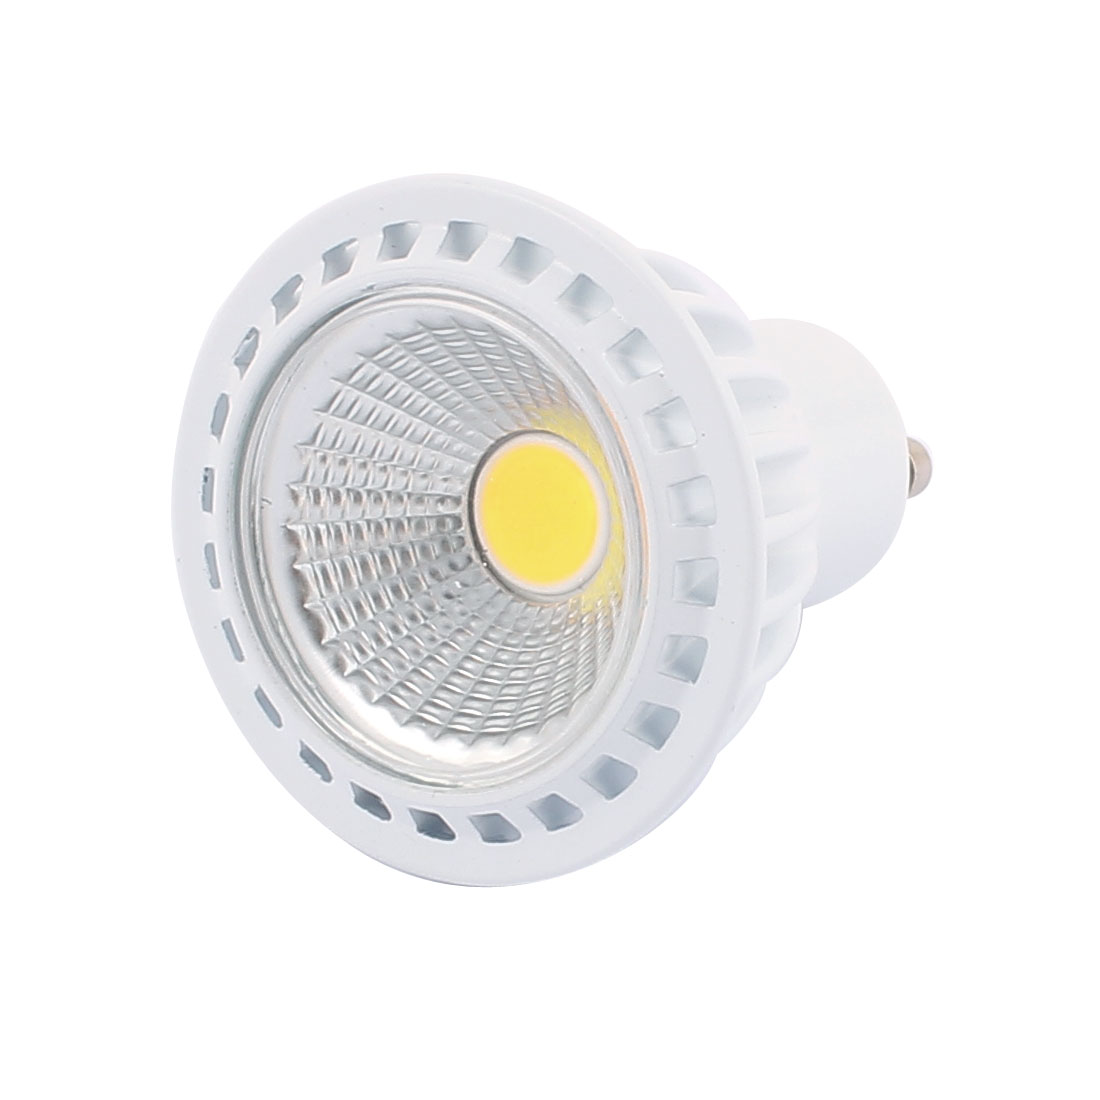 AC85-265V 5W GU10 COB LED Spotlight Lamp Bulb Practical Downlight Pure White